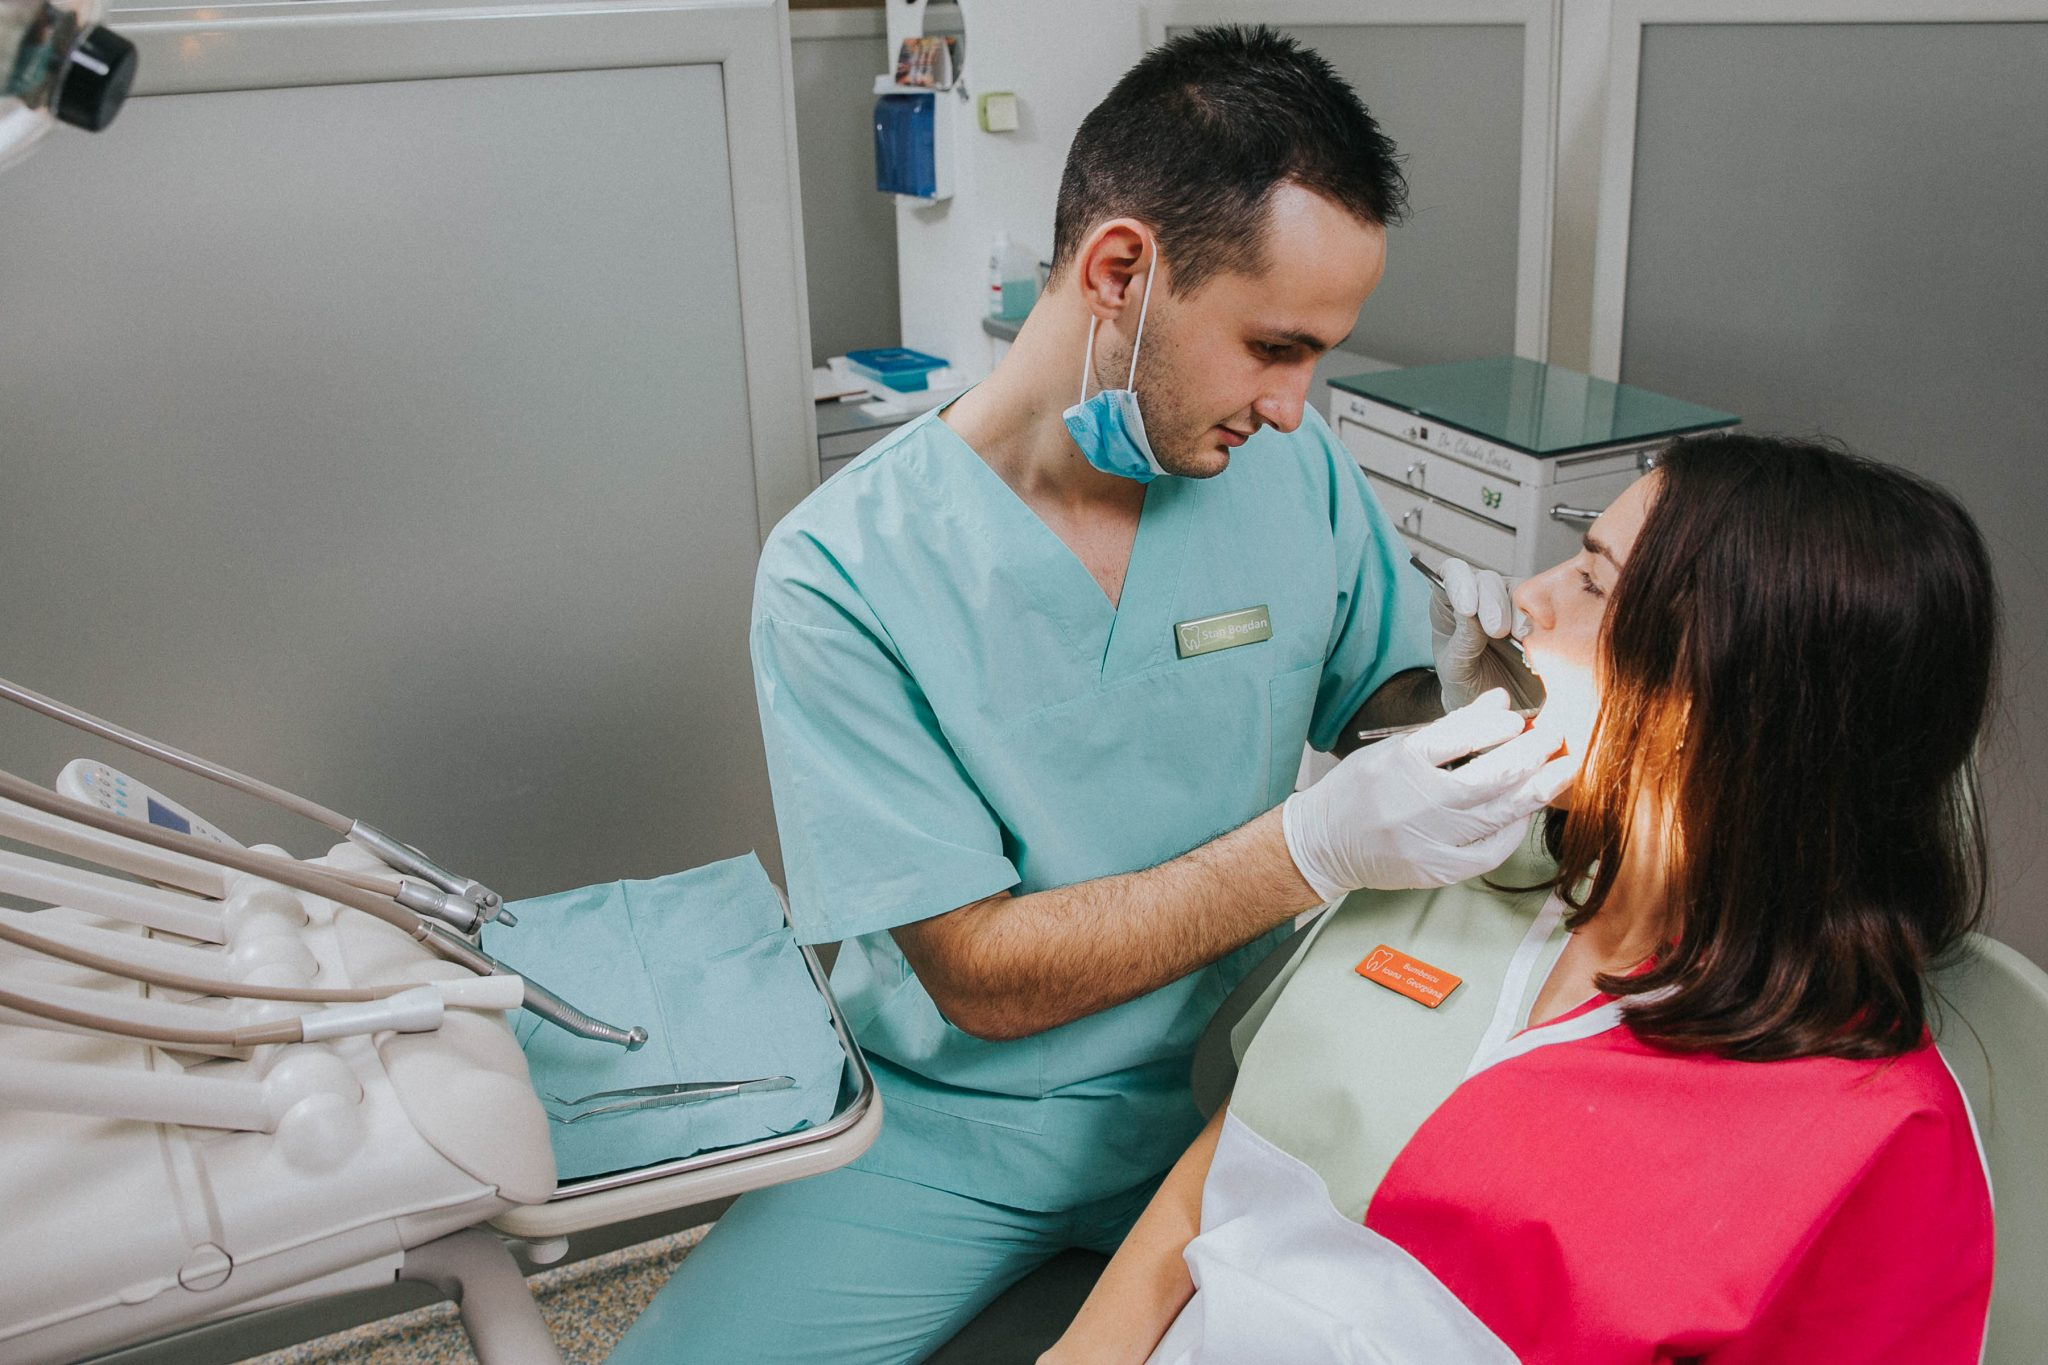 facultatea de stamatologie targu mures UMF absolvenit stamatolog medic doctor fotografie comerciala fotograf profesionist majos daniel_-3